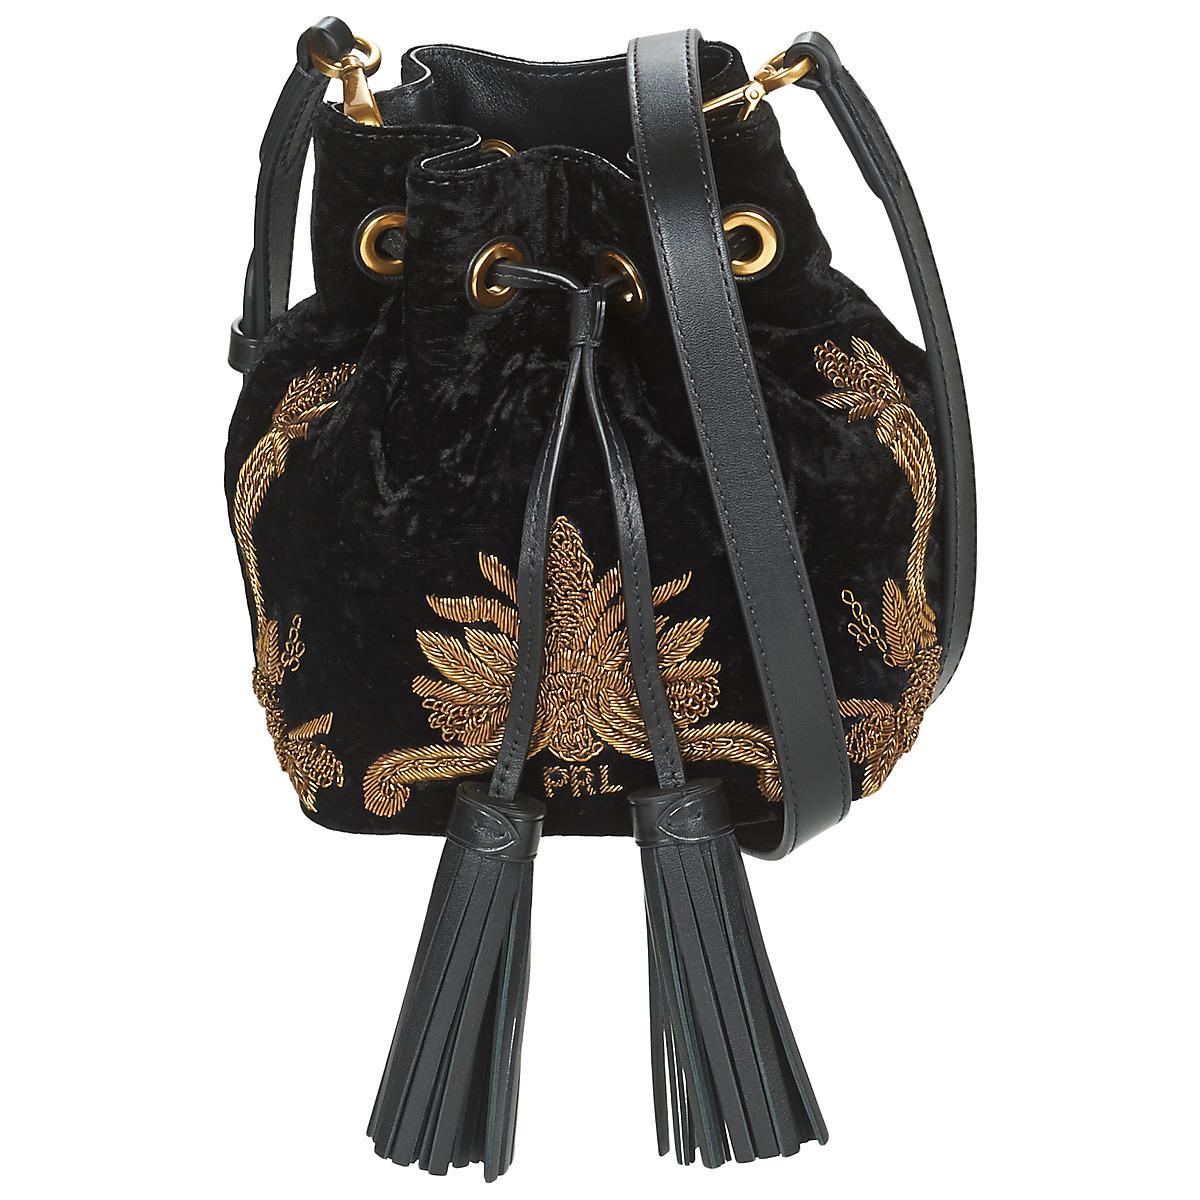 a2934154fd00 Polo Ralph Lauren Velvet W Bullion Sm Drawstrng Women s Shoulder Bag ...